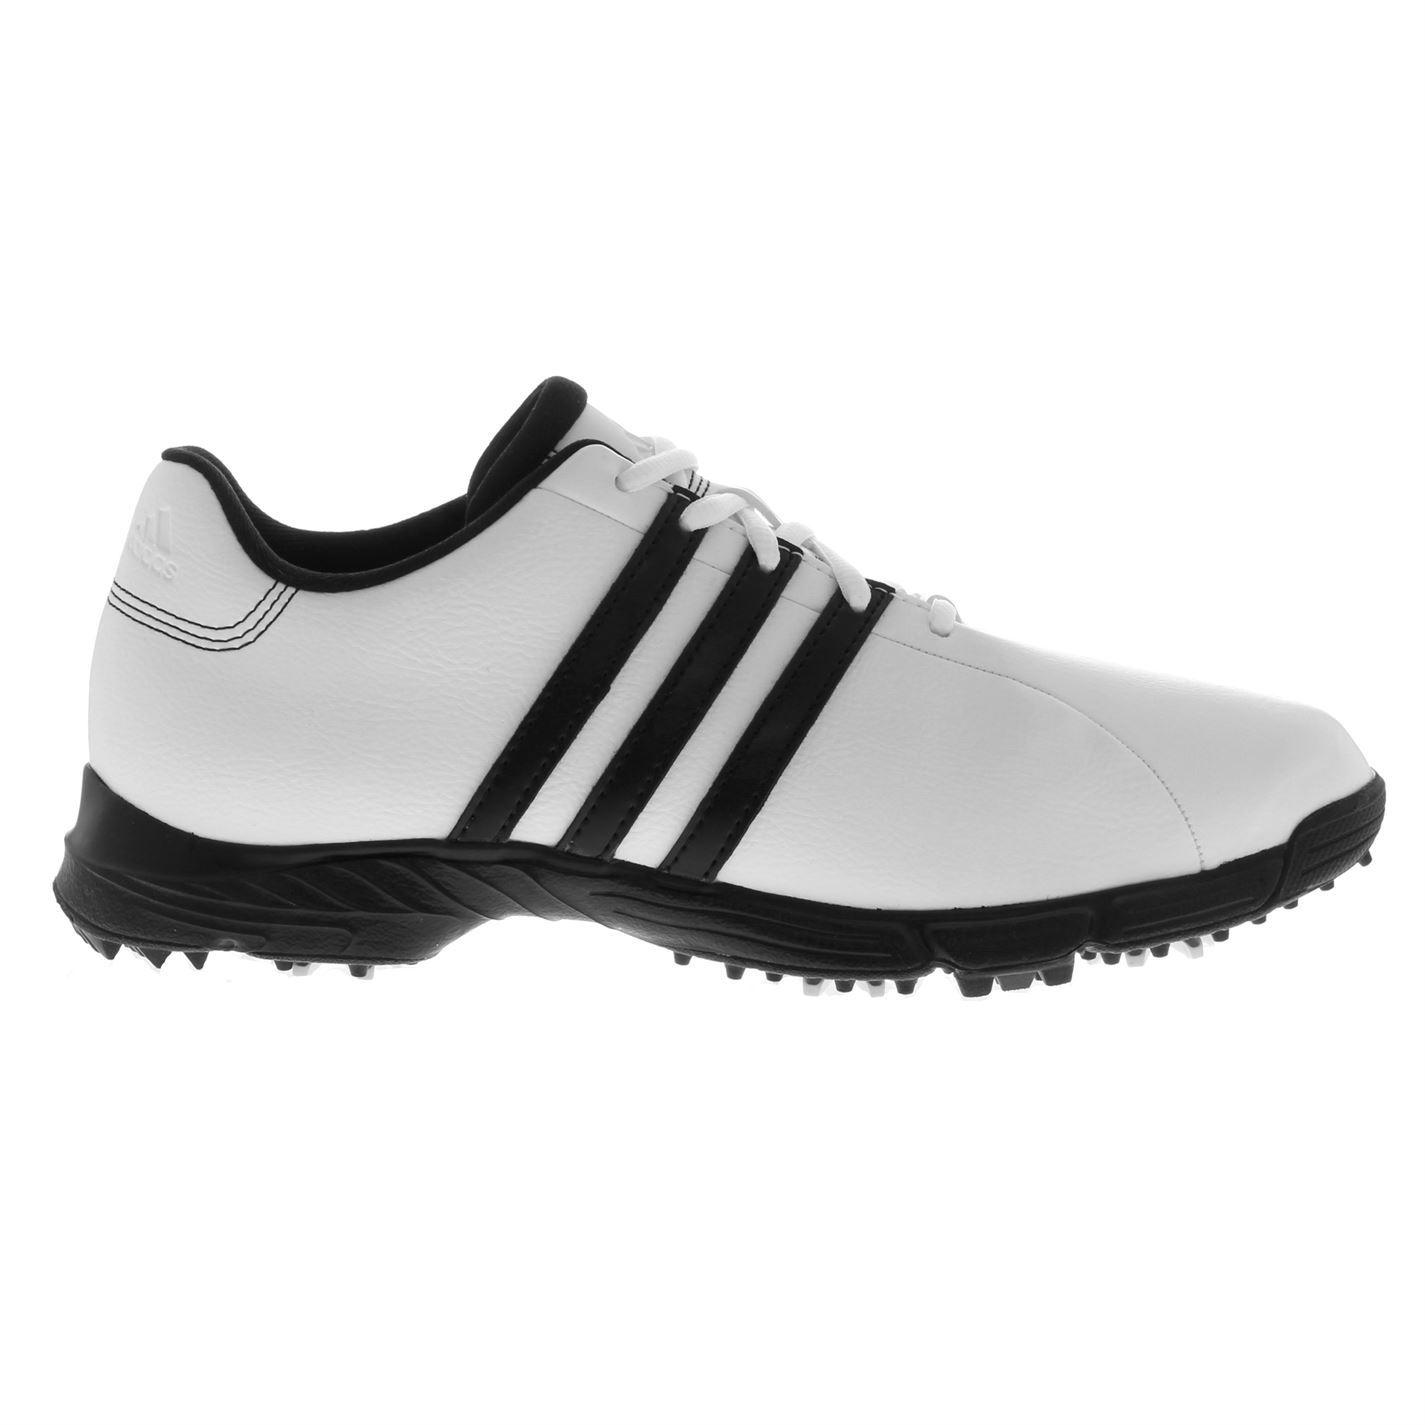 adidas-Golflite-Golf-Shoes-Mens-Spikes-Footwear thumbnail 16